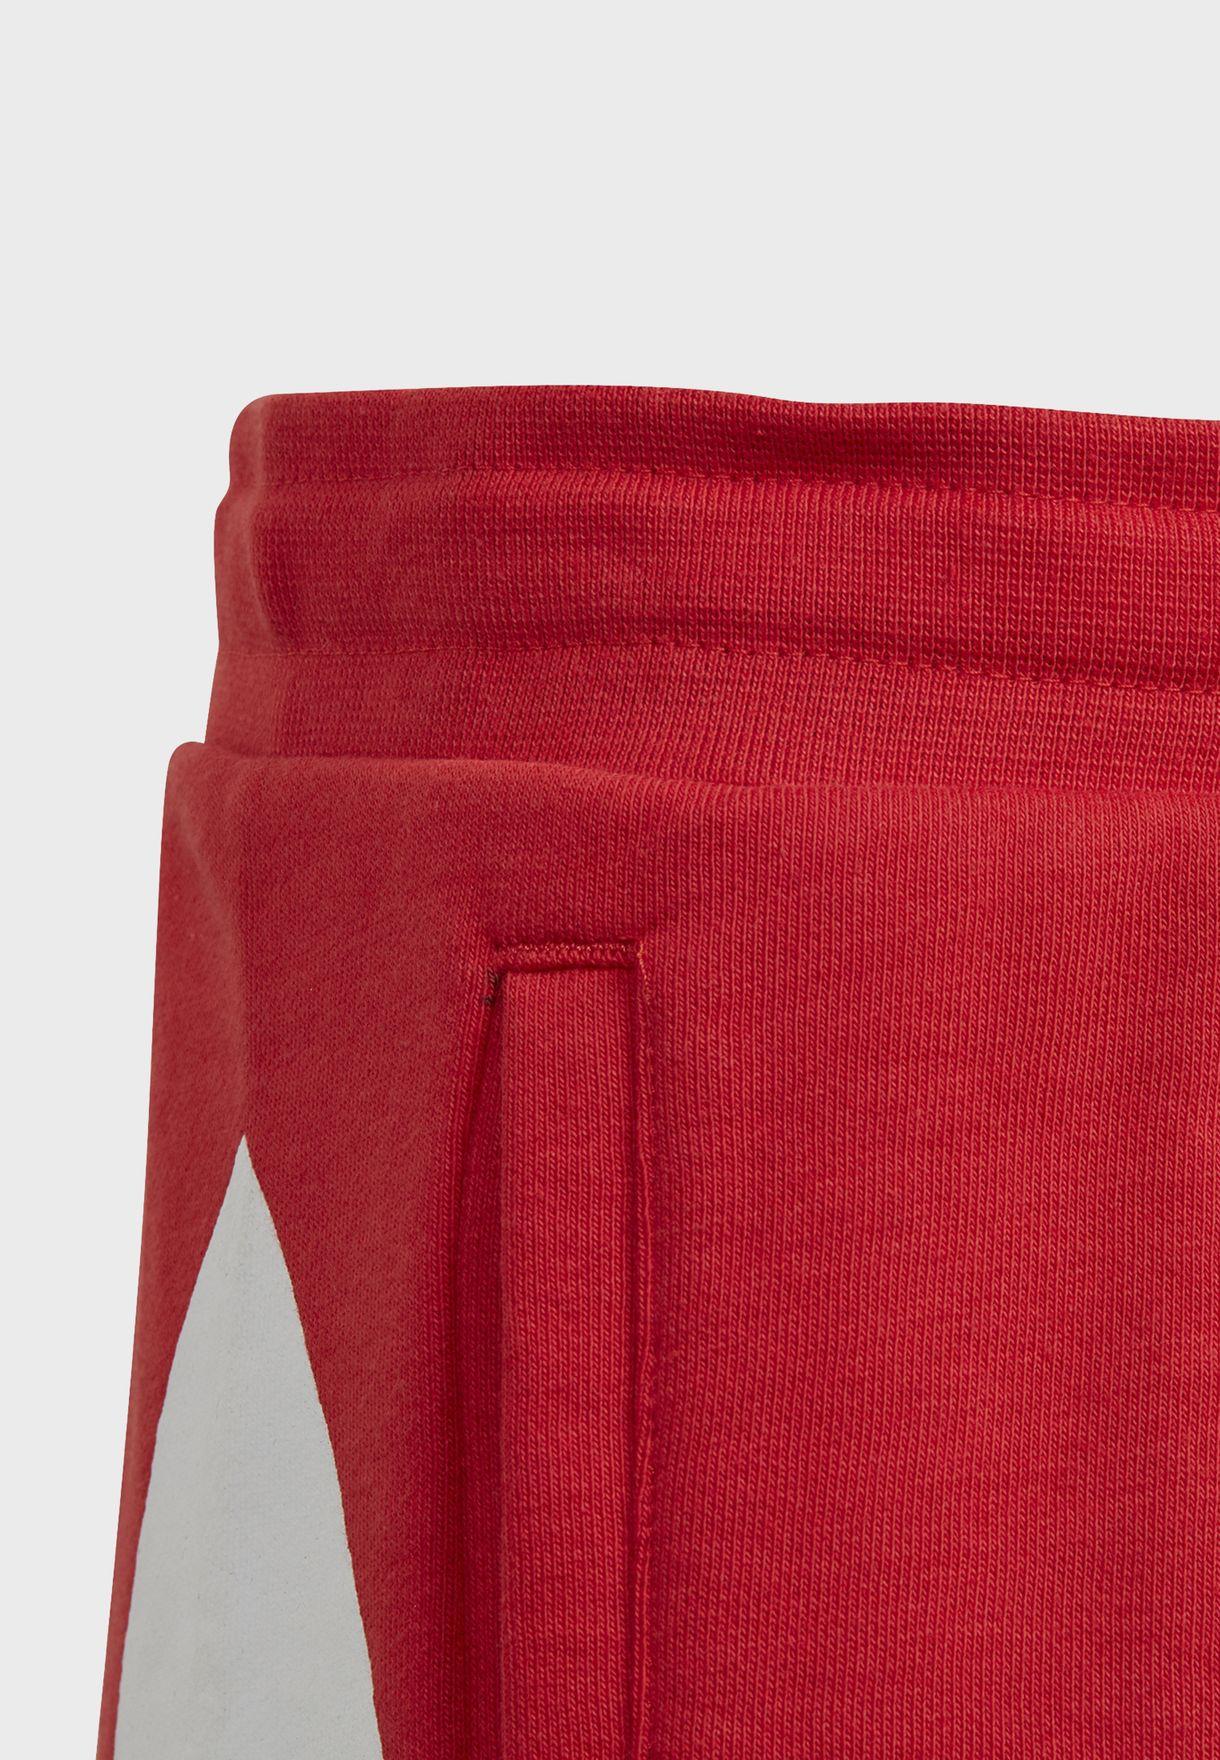 Youth Trefoil Shorts